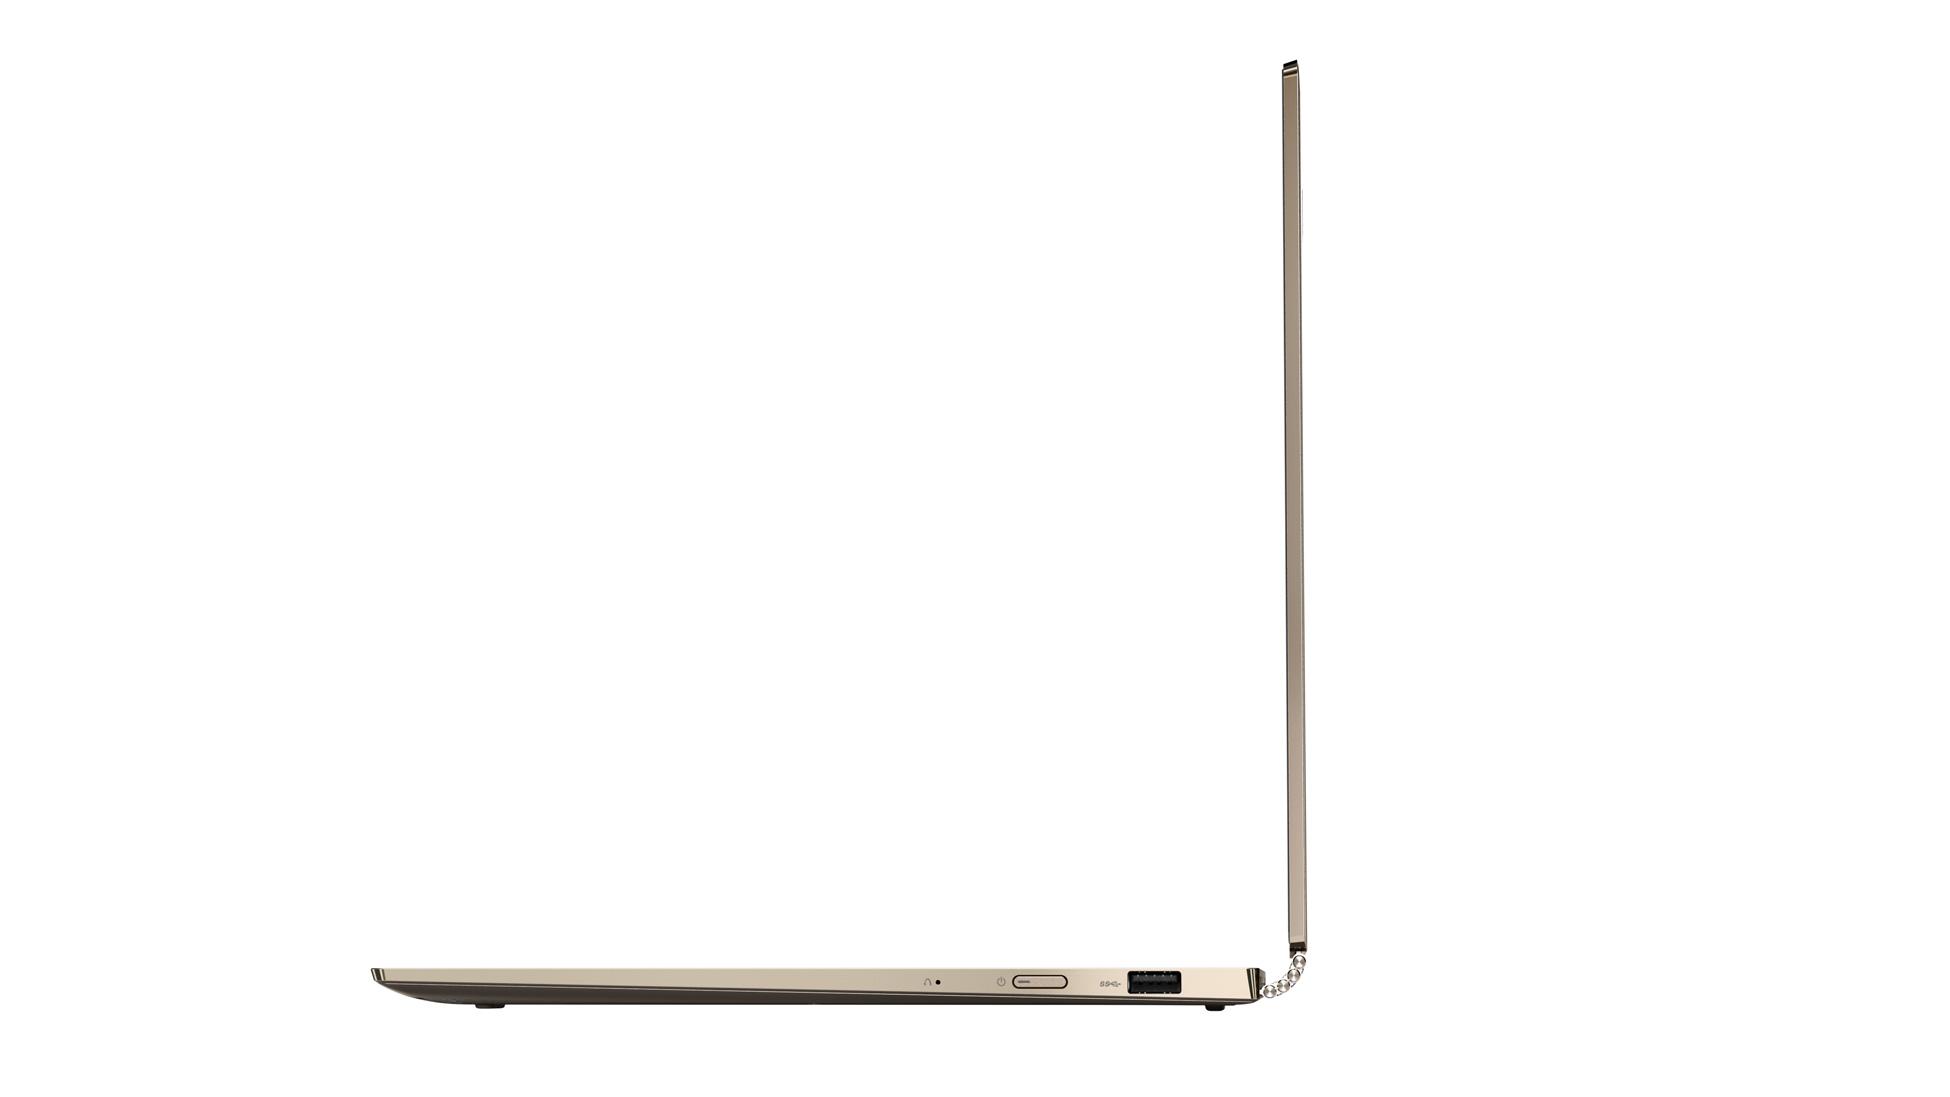 Фото  Ультрабук Lenovo Yoga 920 Bronze (80Y700FRRA)